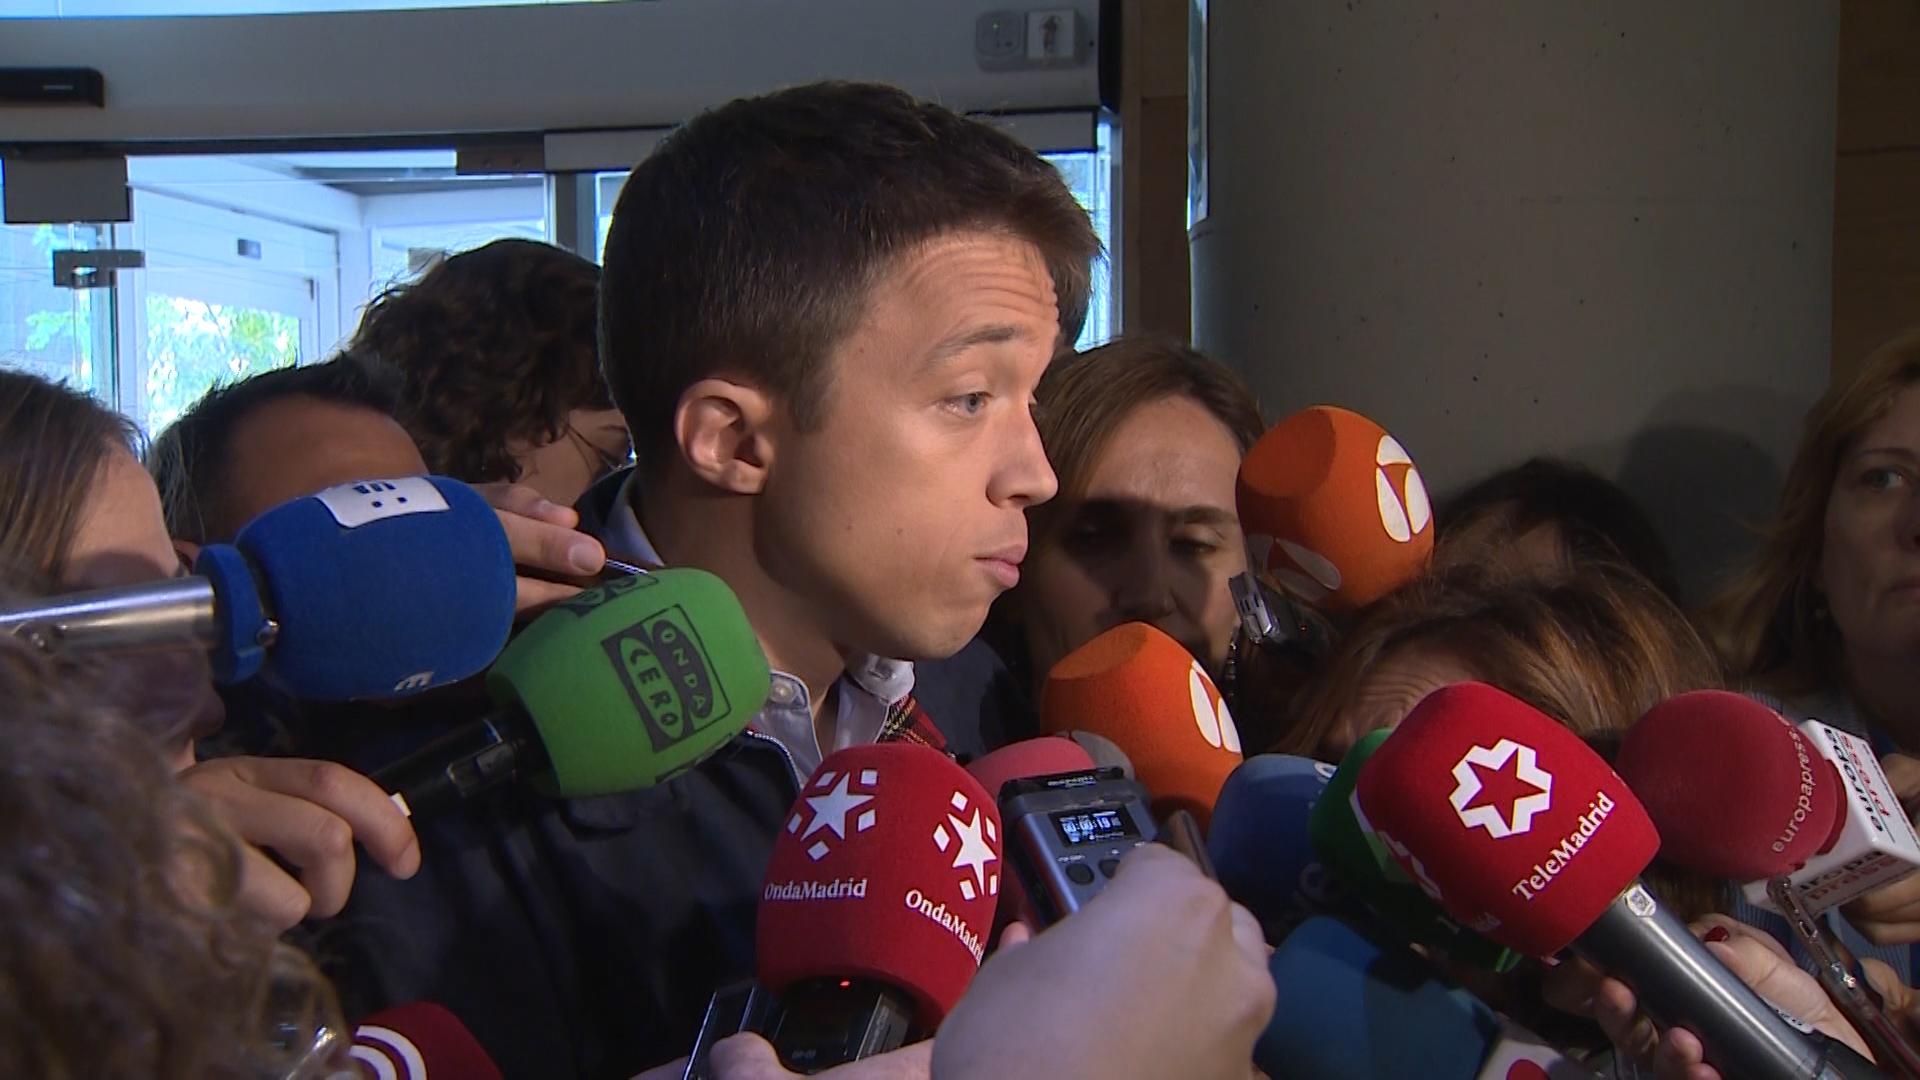 Público Tv - Errejón planteará mañana al PSOE una reunión a tres con Cs